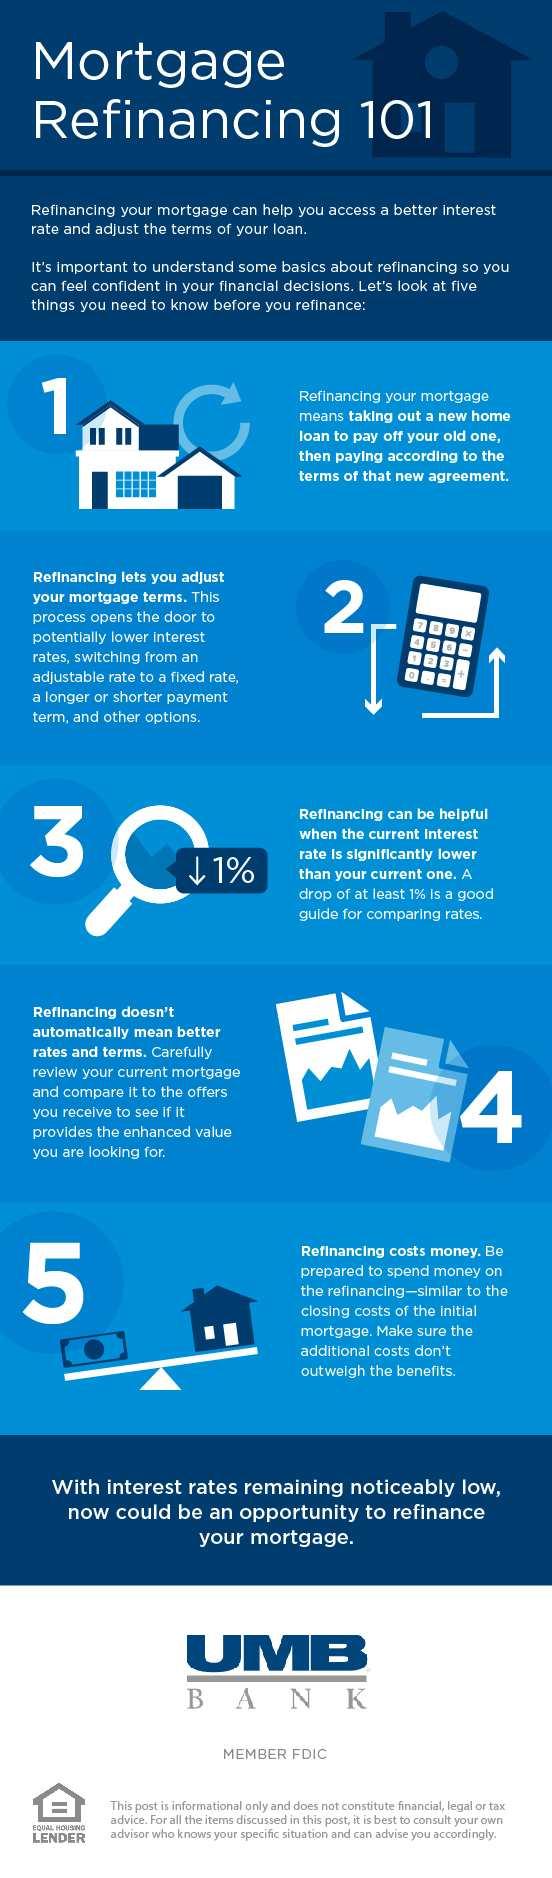 UMB Mortgage Refinancing Infographic 1 resize